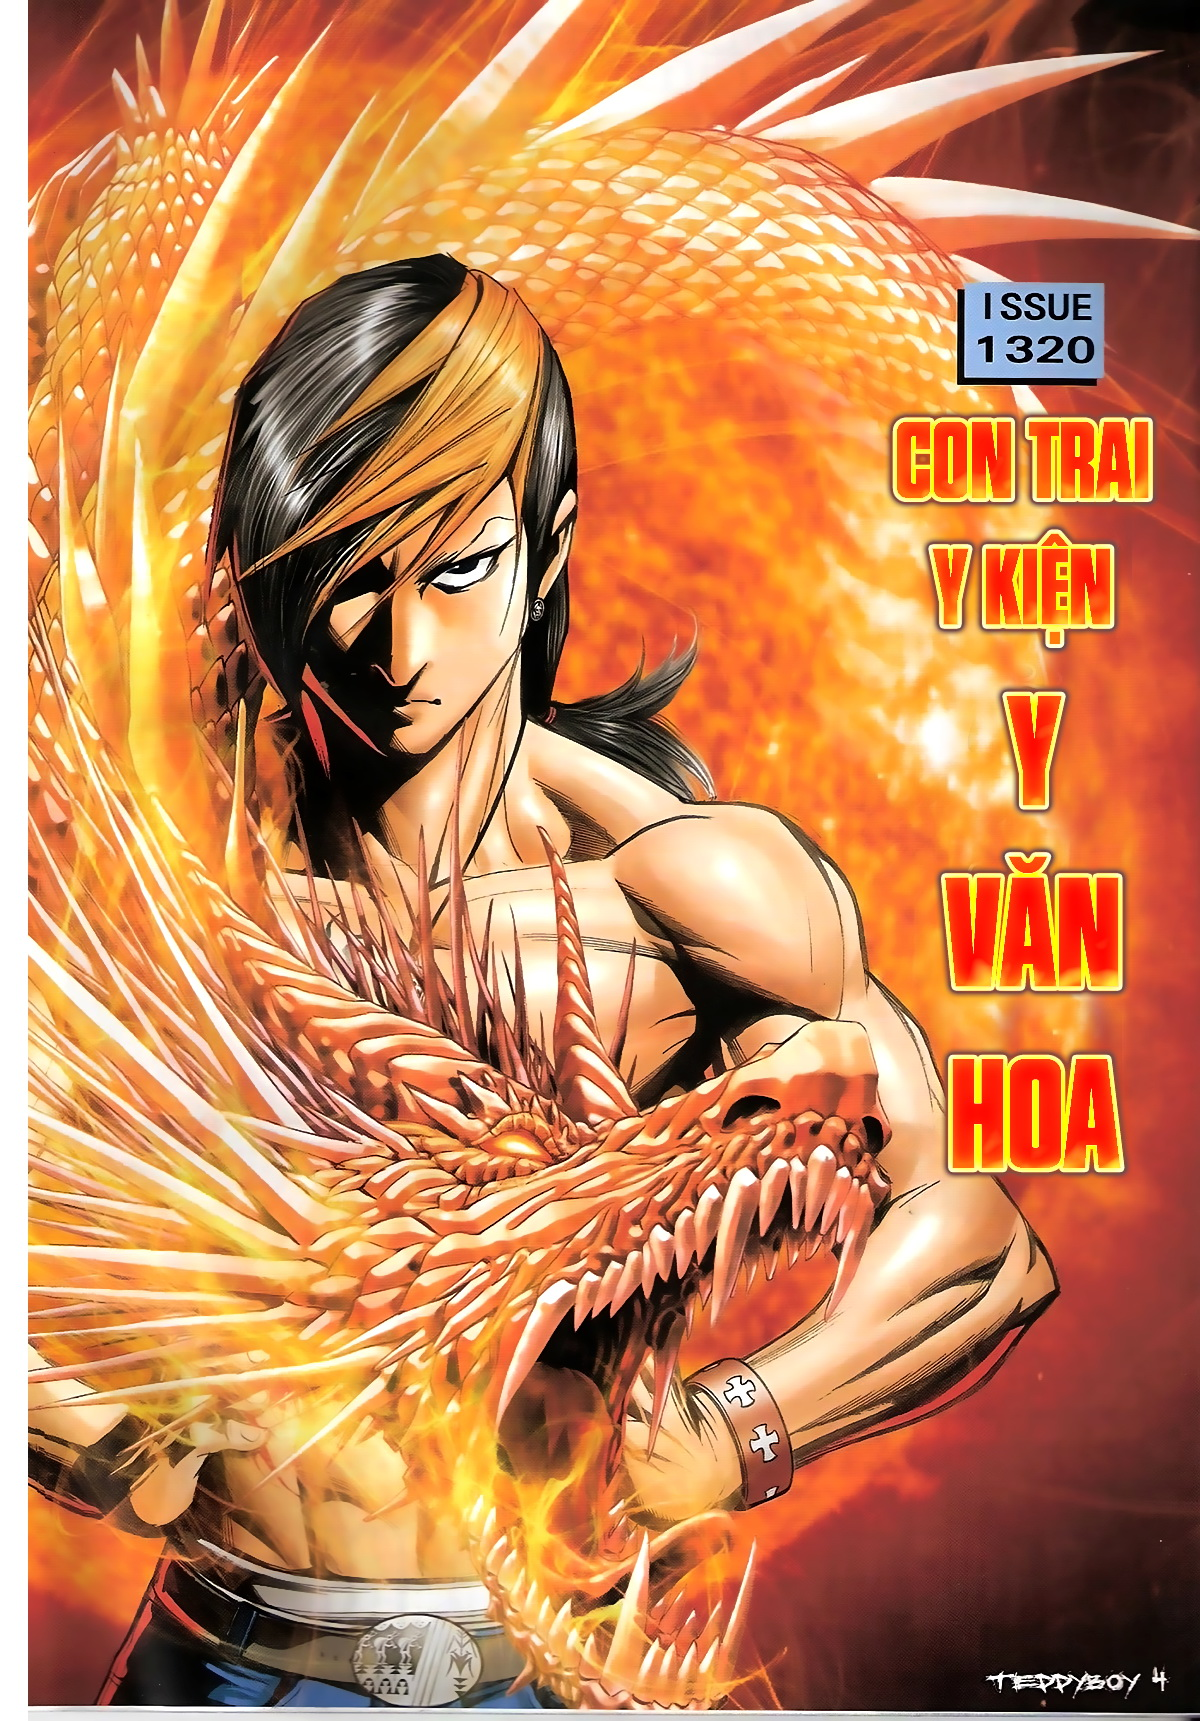 Người Trong Giang Hồ - Chapter 1320: Con trai Y Kiện - Pic 2